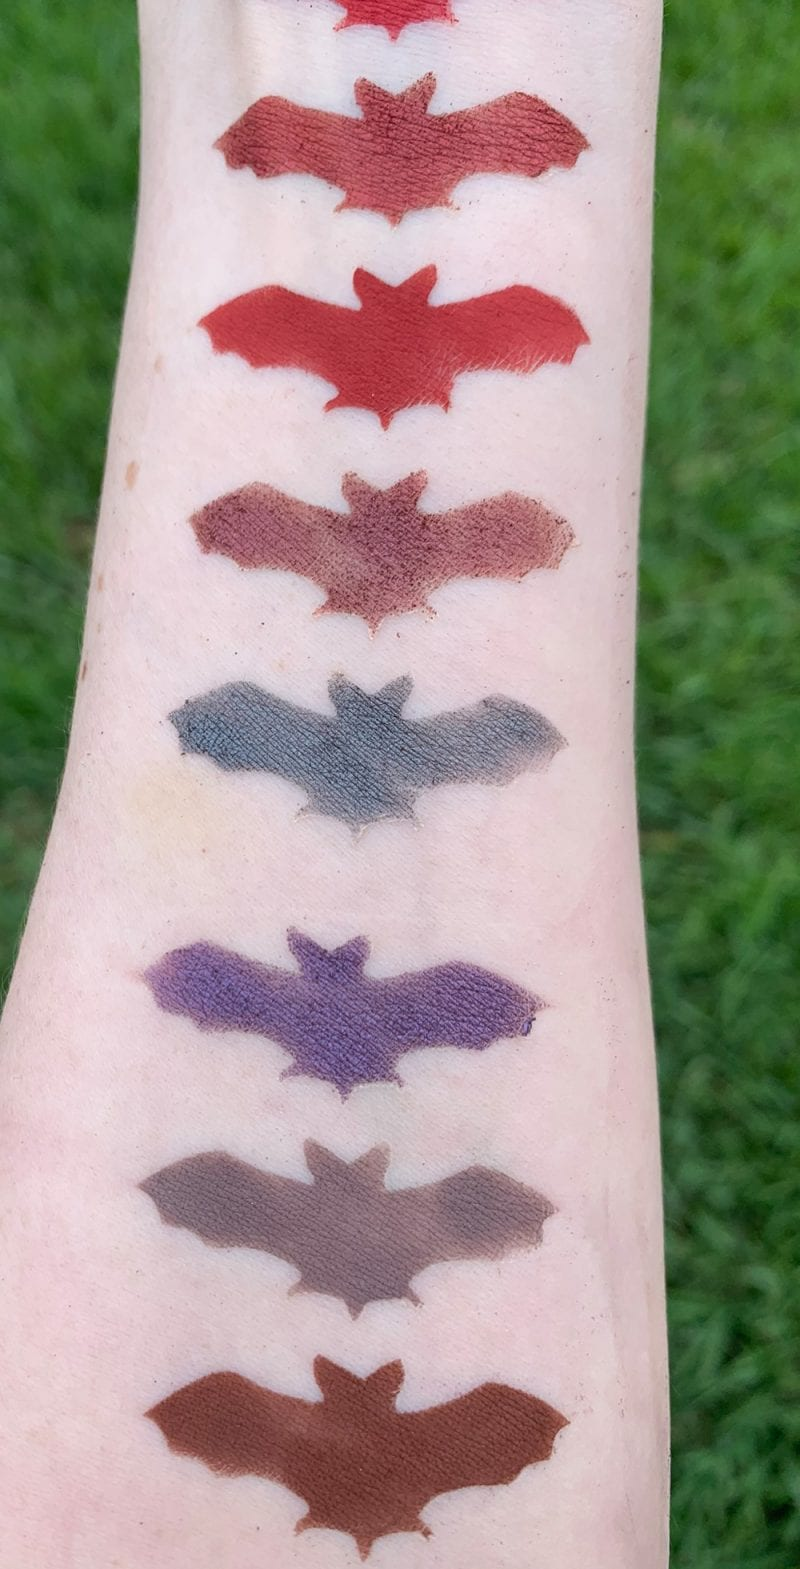 Baby Bat Beauty Nox Palette swatches on Fair Skin